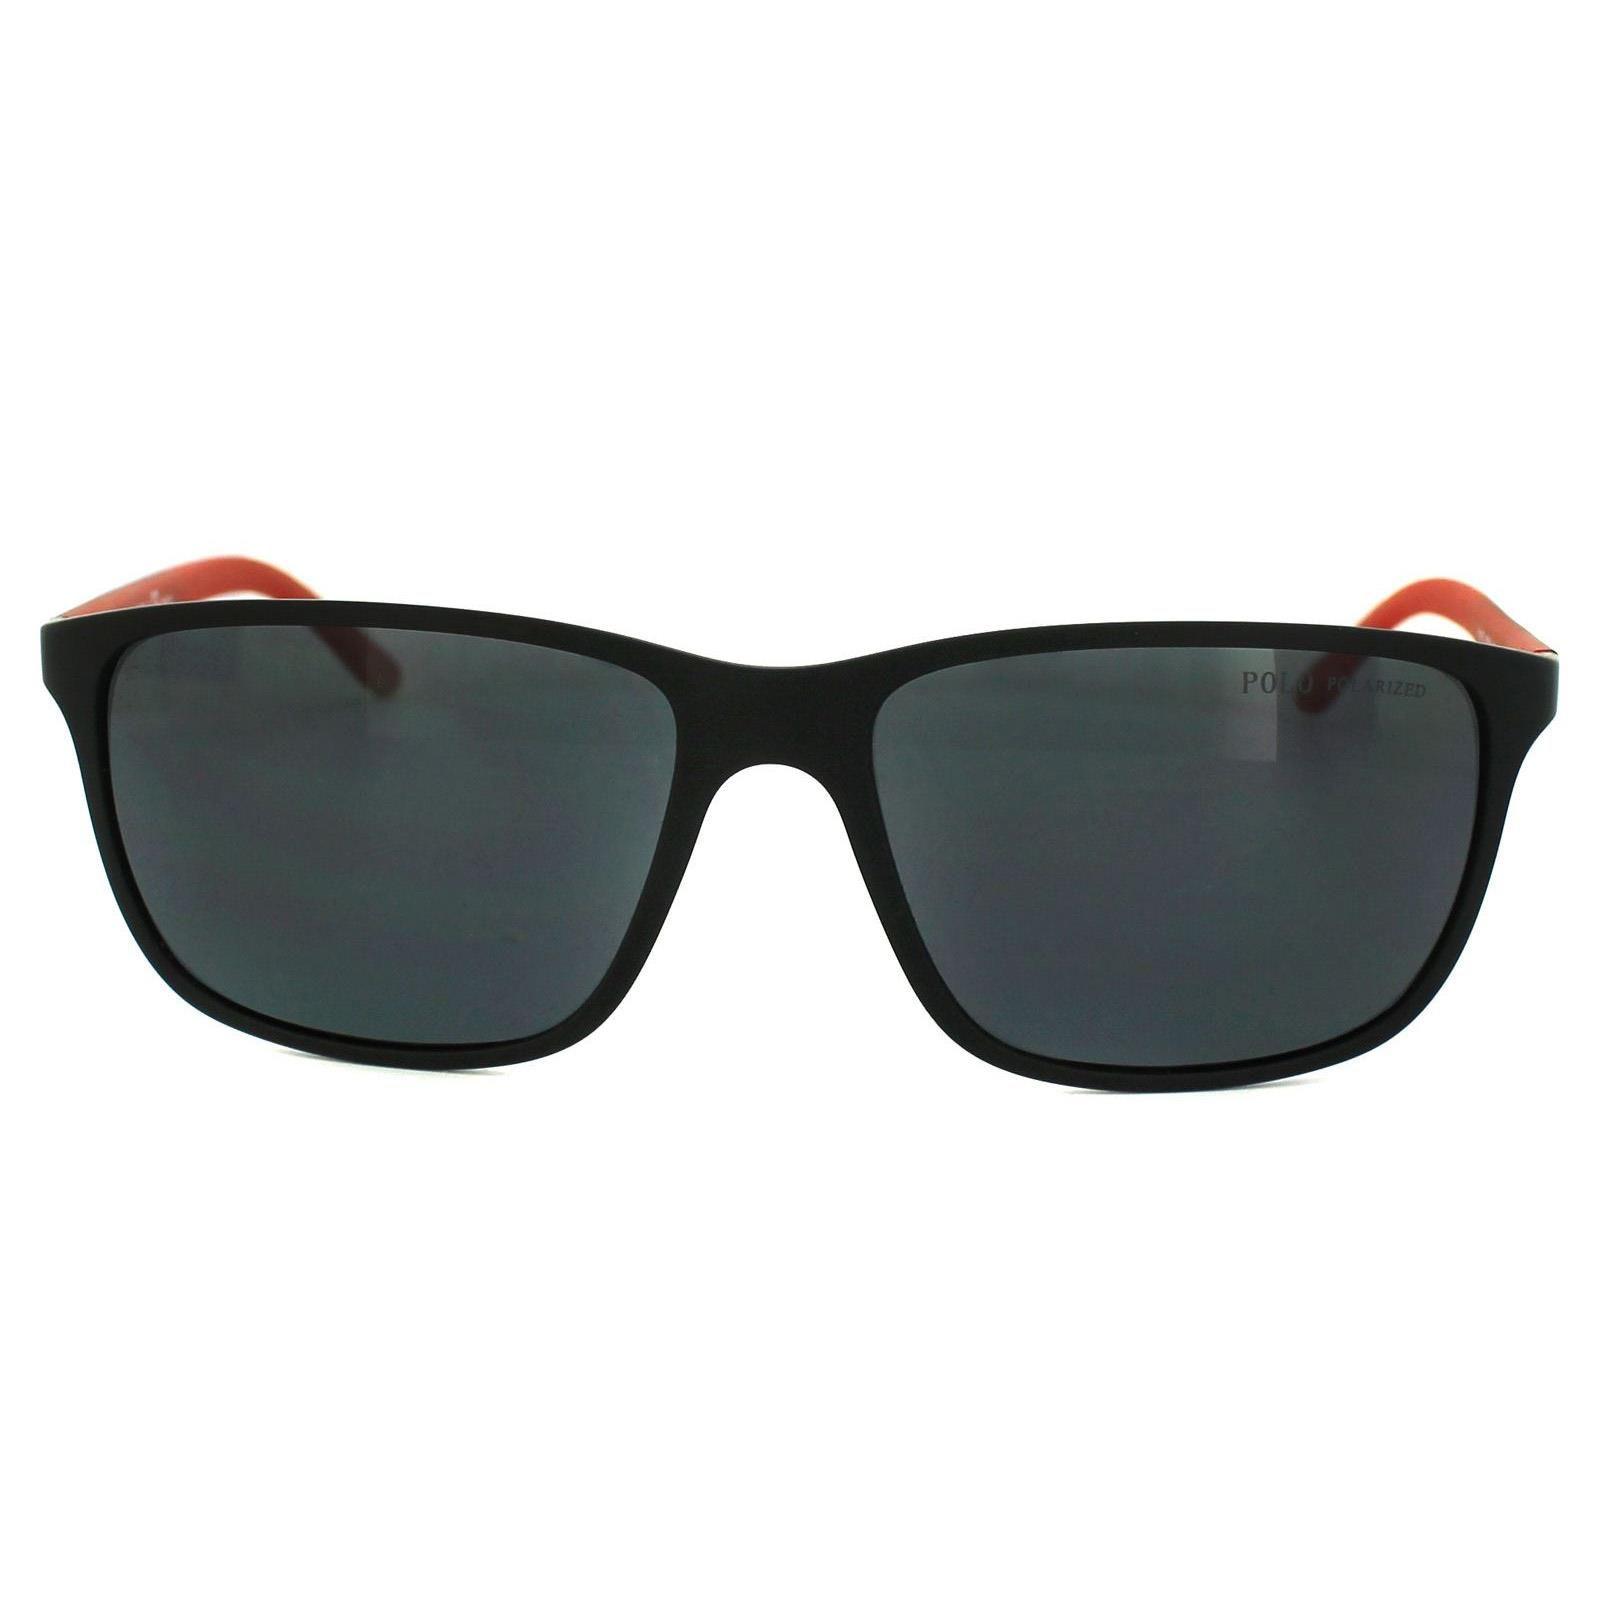 Polo Ralph Lauren Sunglasses 4092 550481 Matt Black Grey Polarized